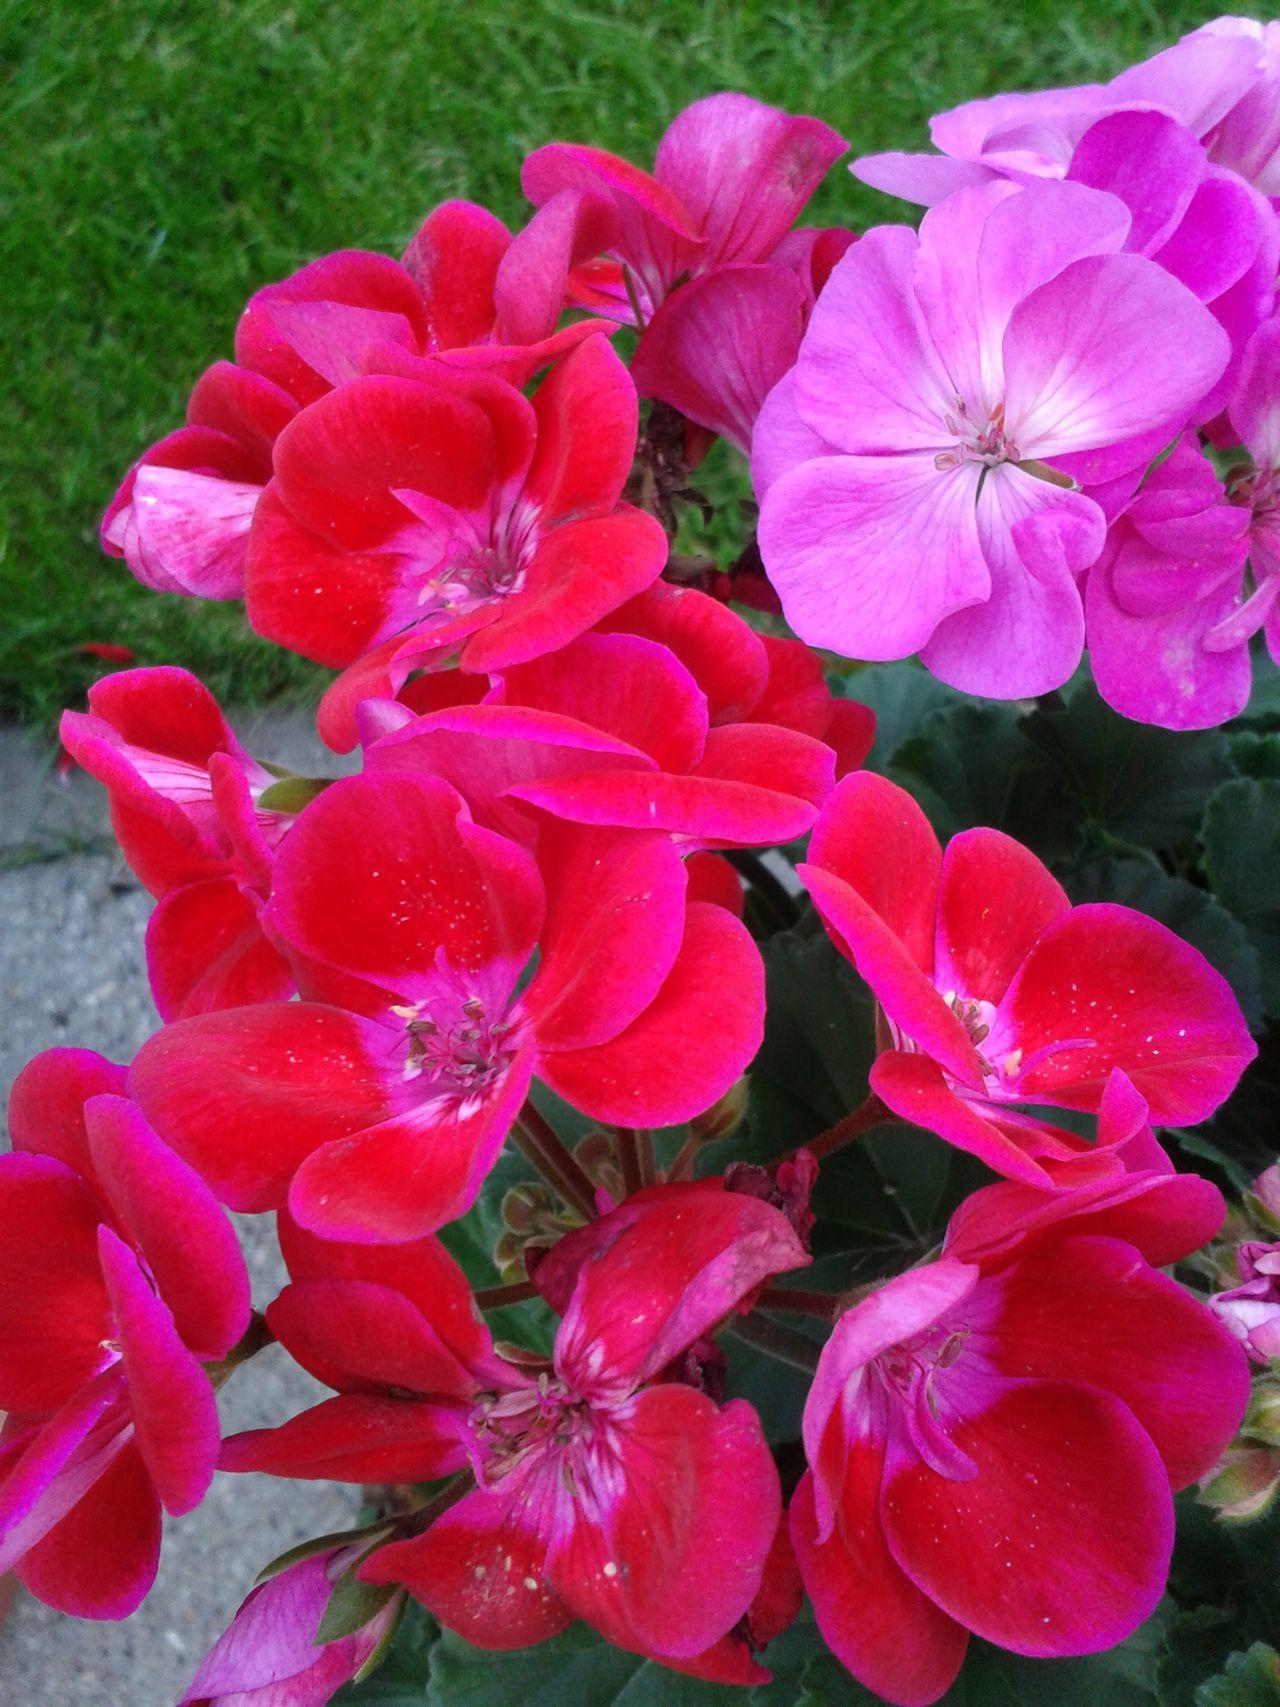 Relaxing Beautiful Flower Beautiful Nature Flowers